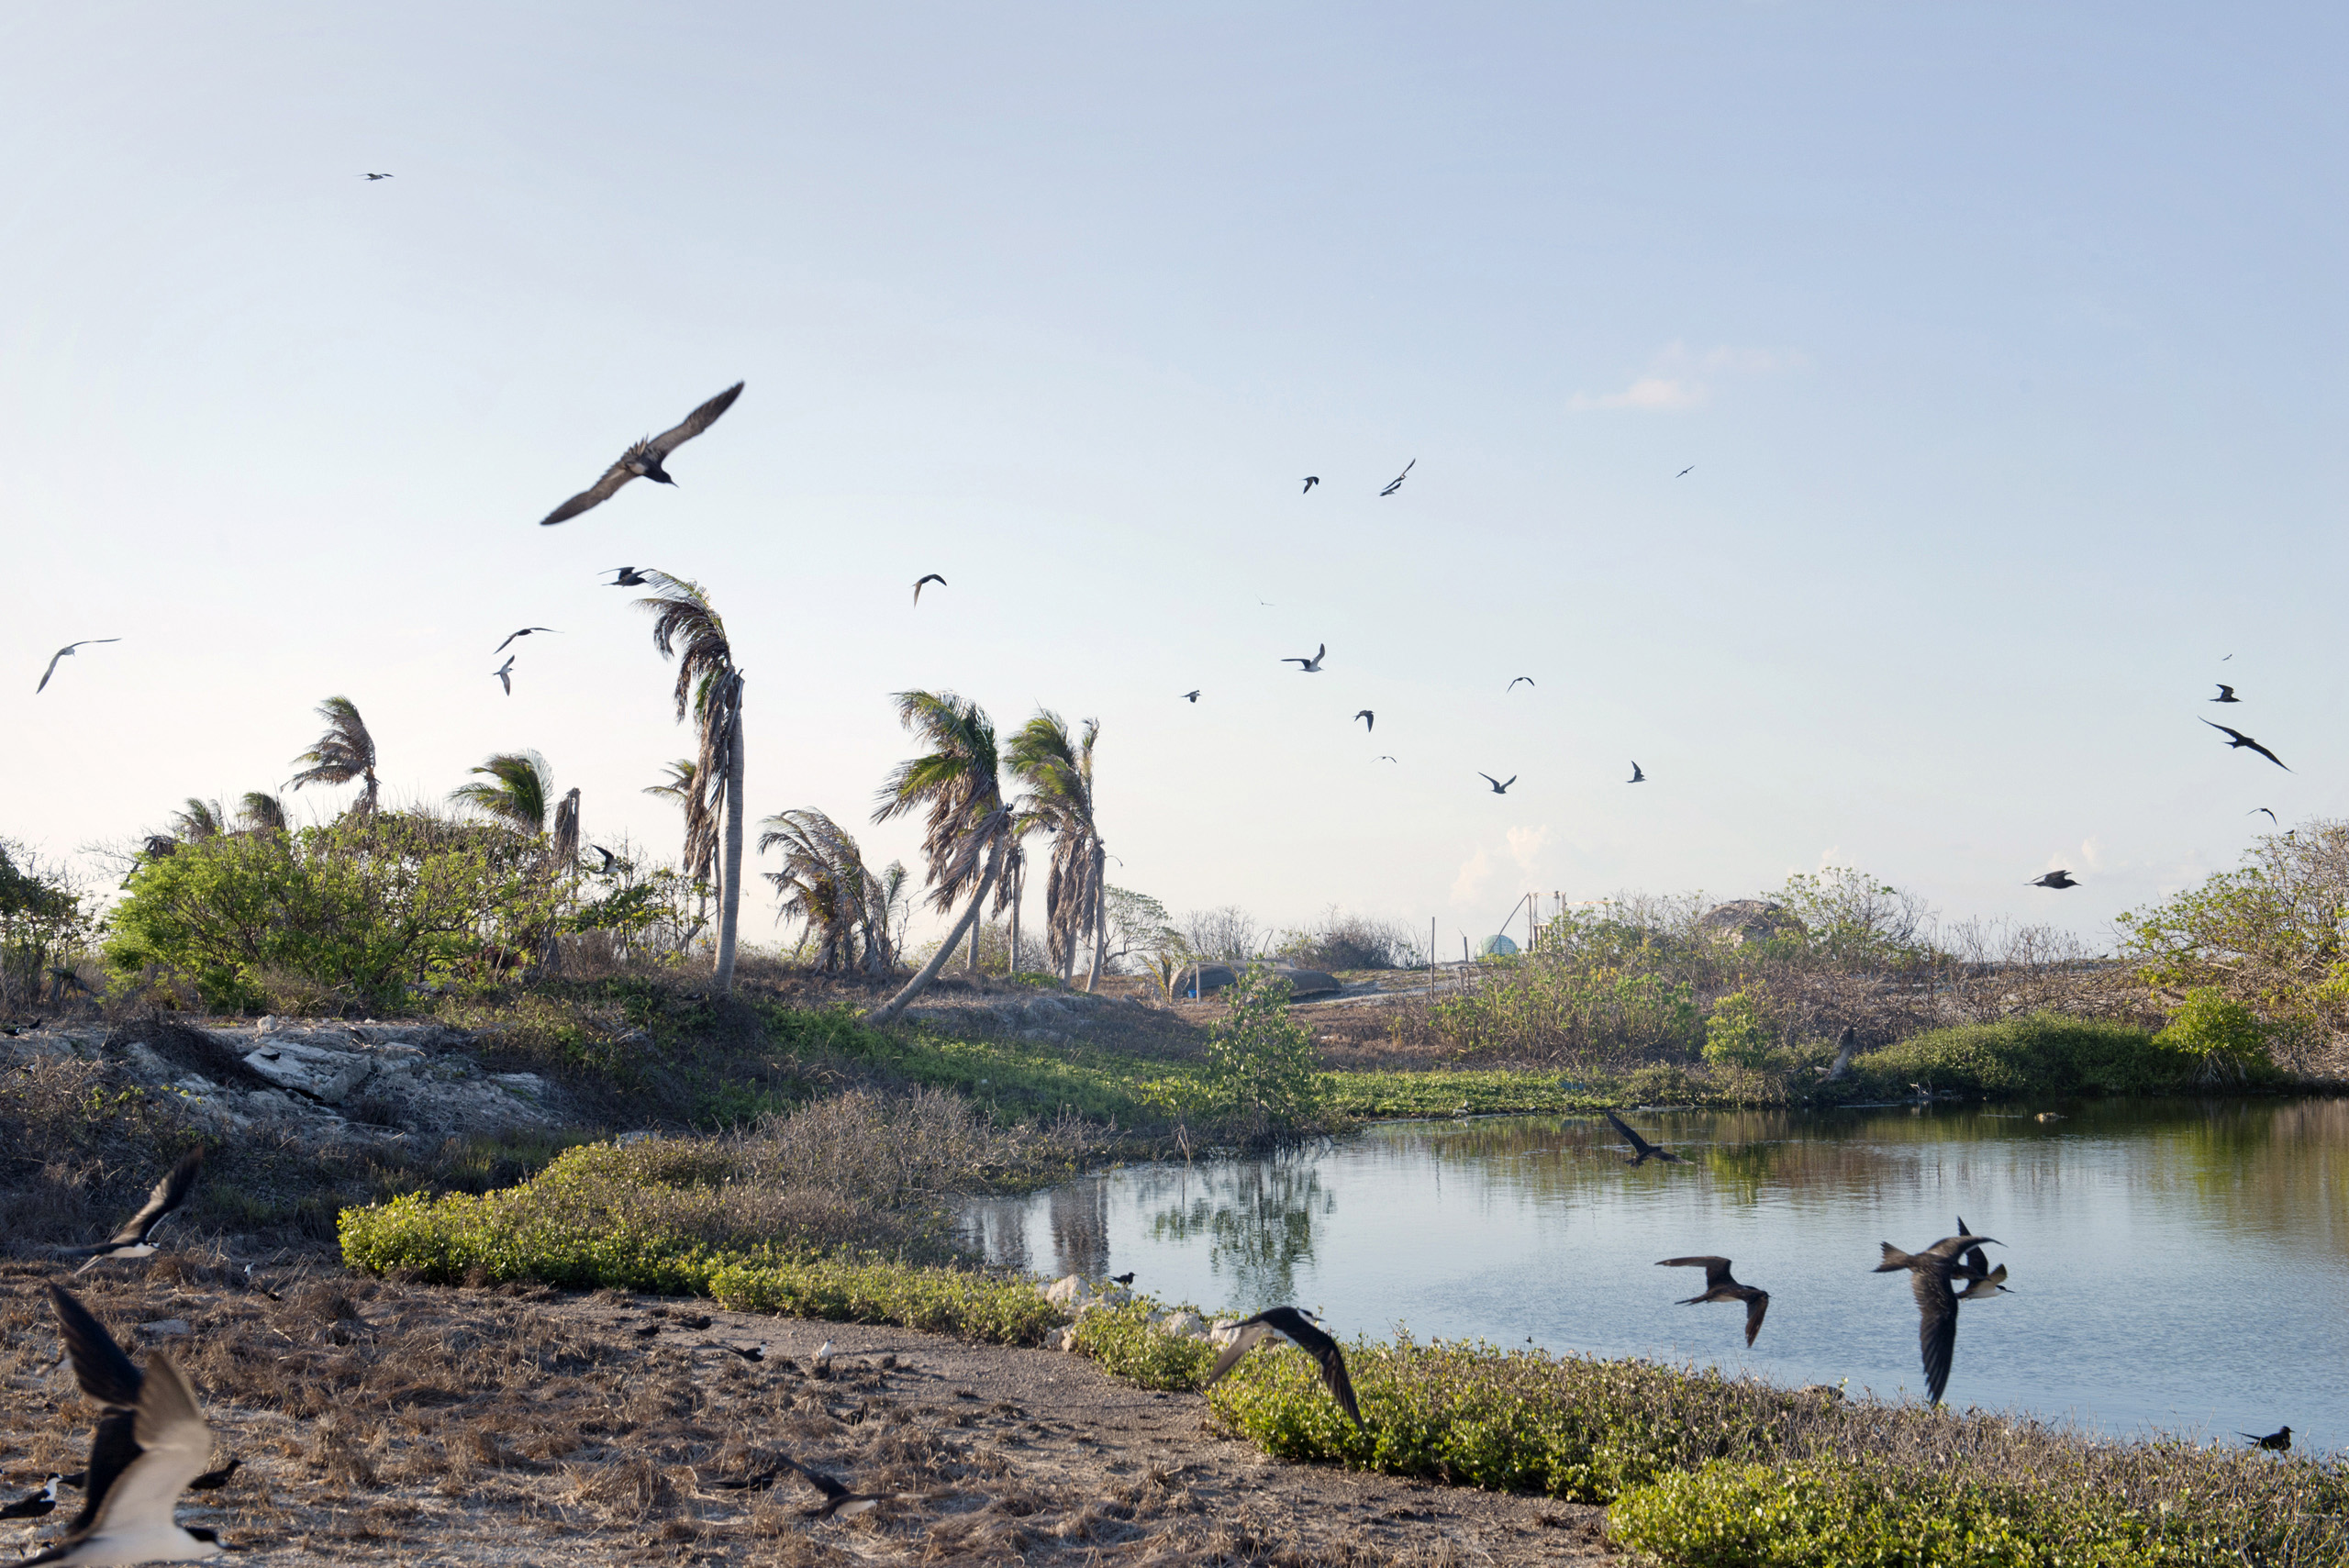 Birds on Nanshan Island, May 8, 2016.